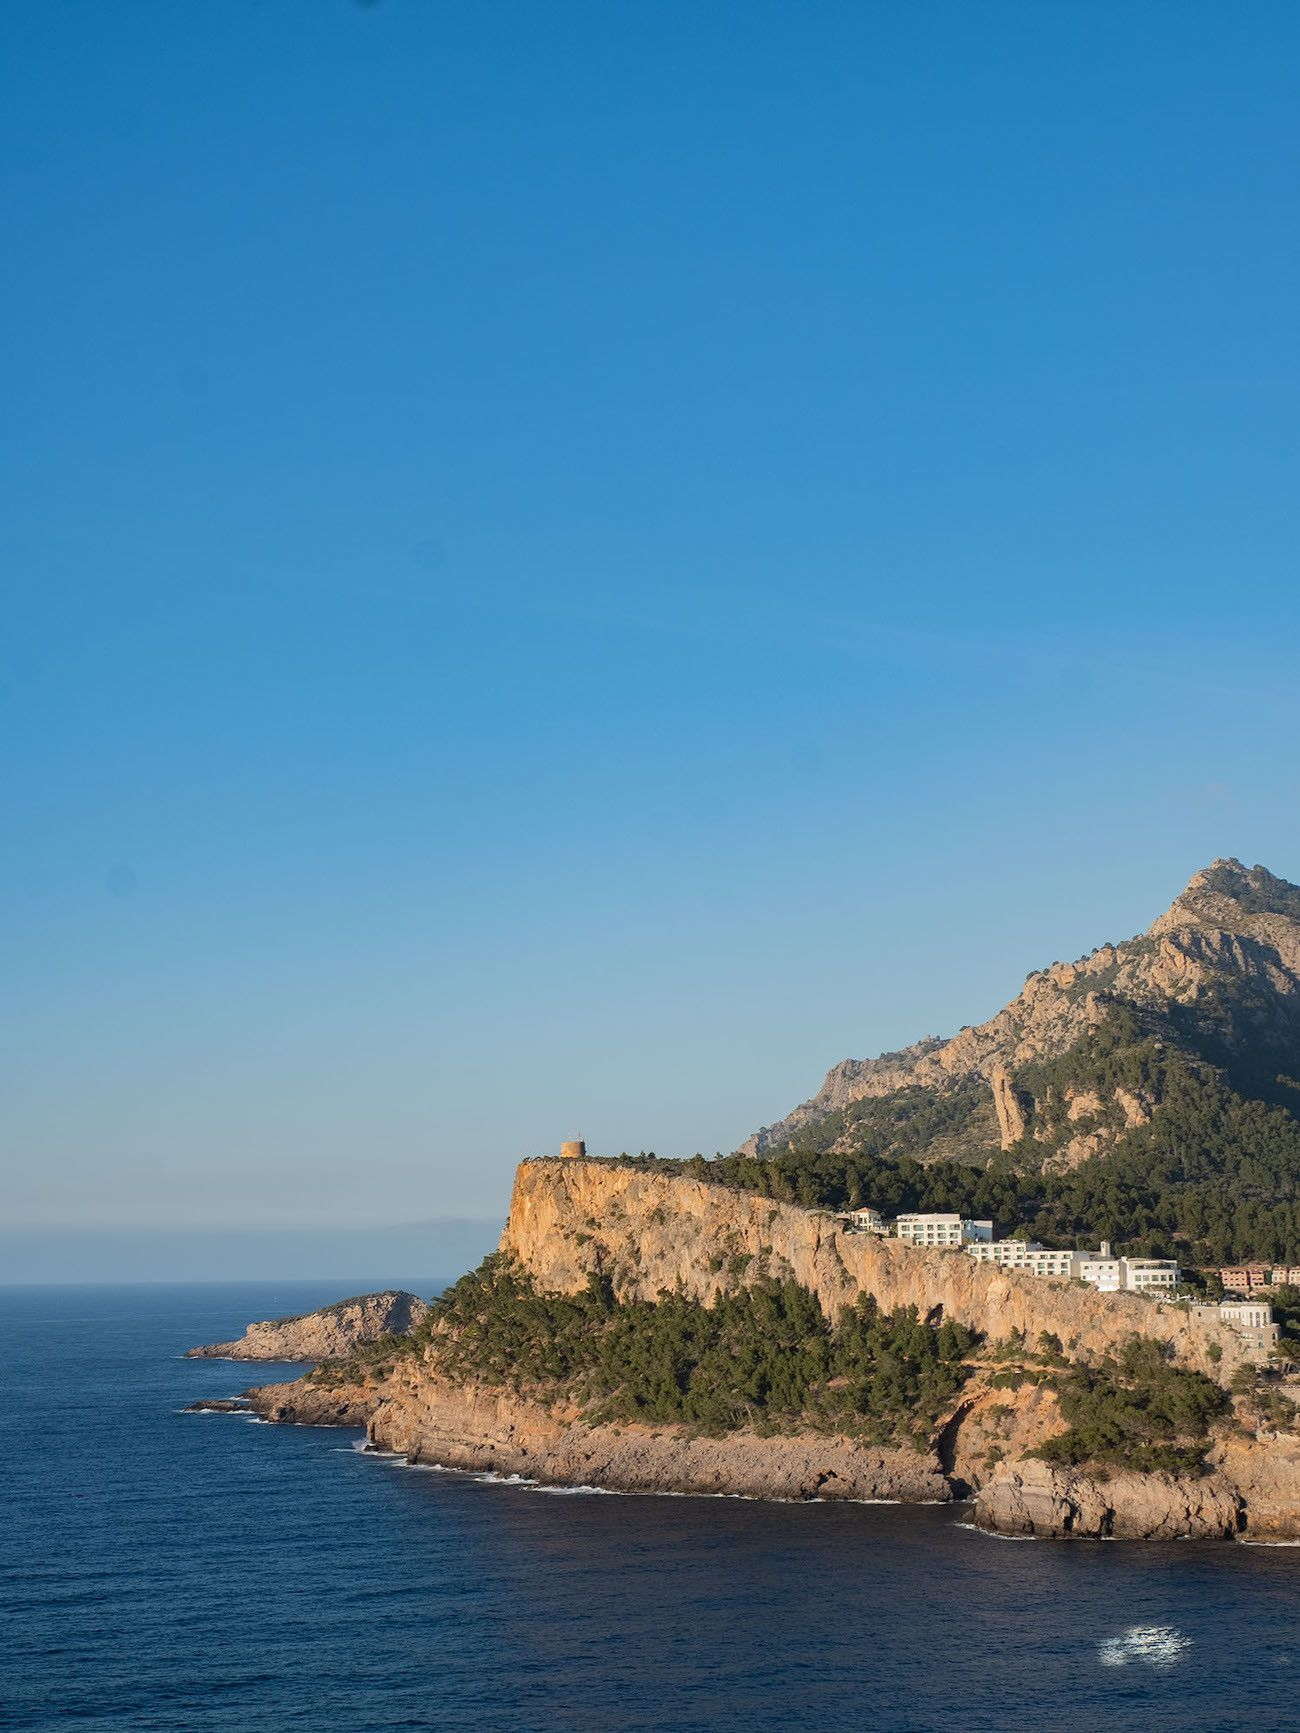 Foodblog About Fuel, Bikini Island & Mountain Hotels, Port de Sóller